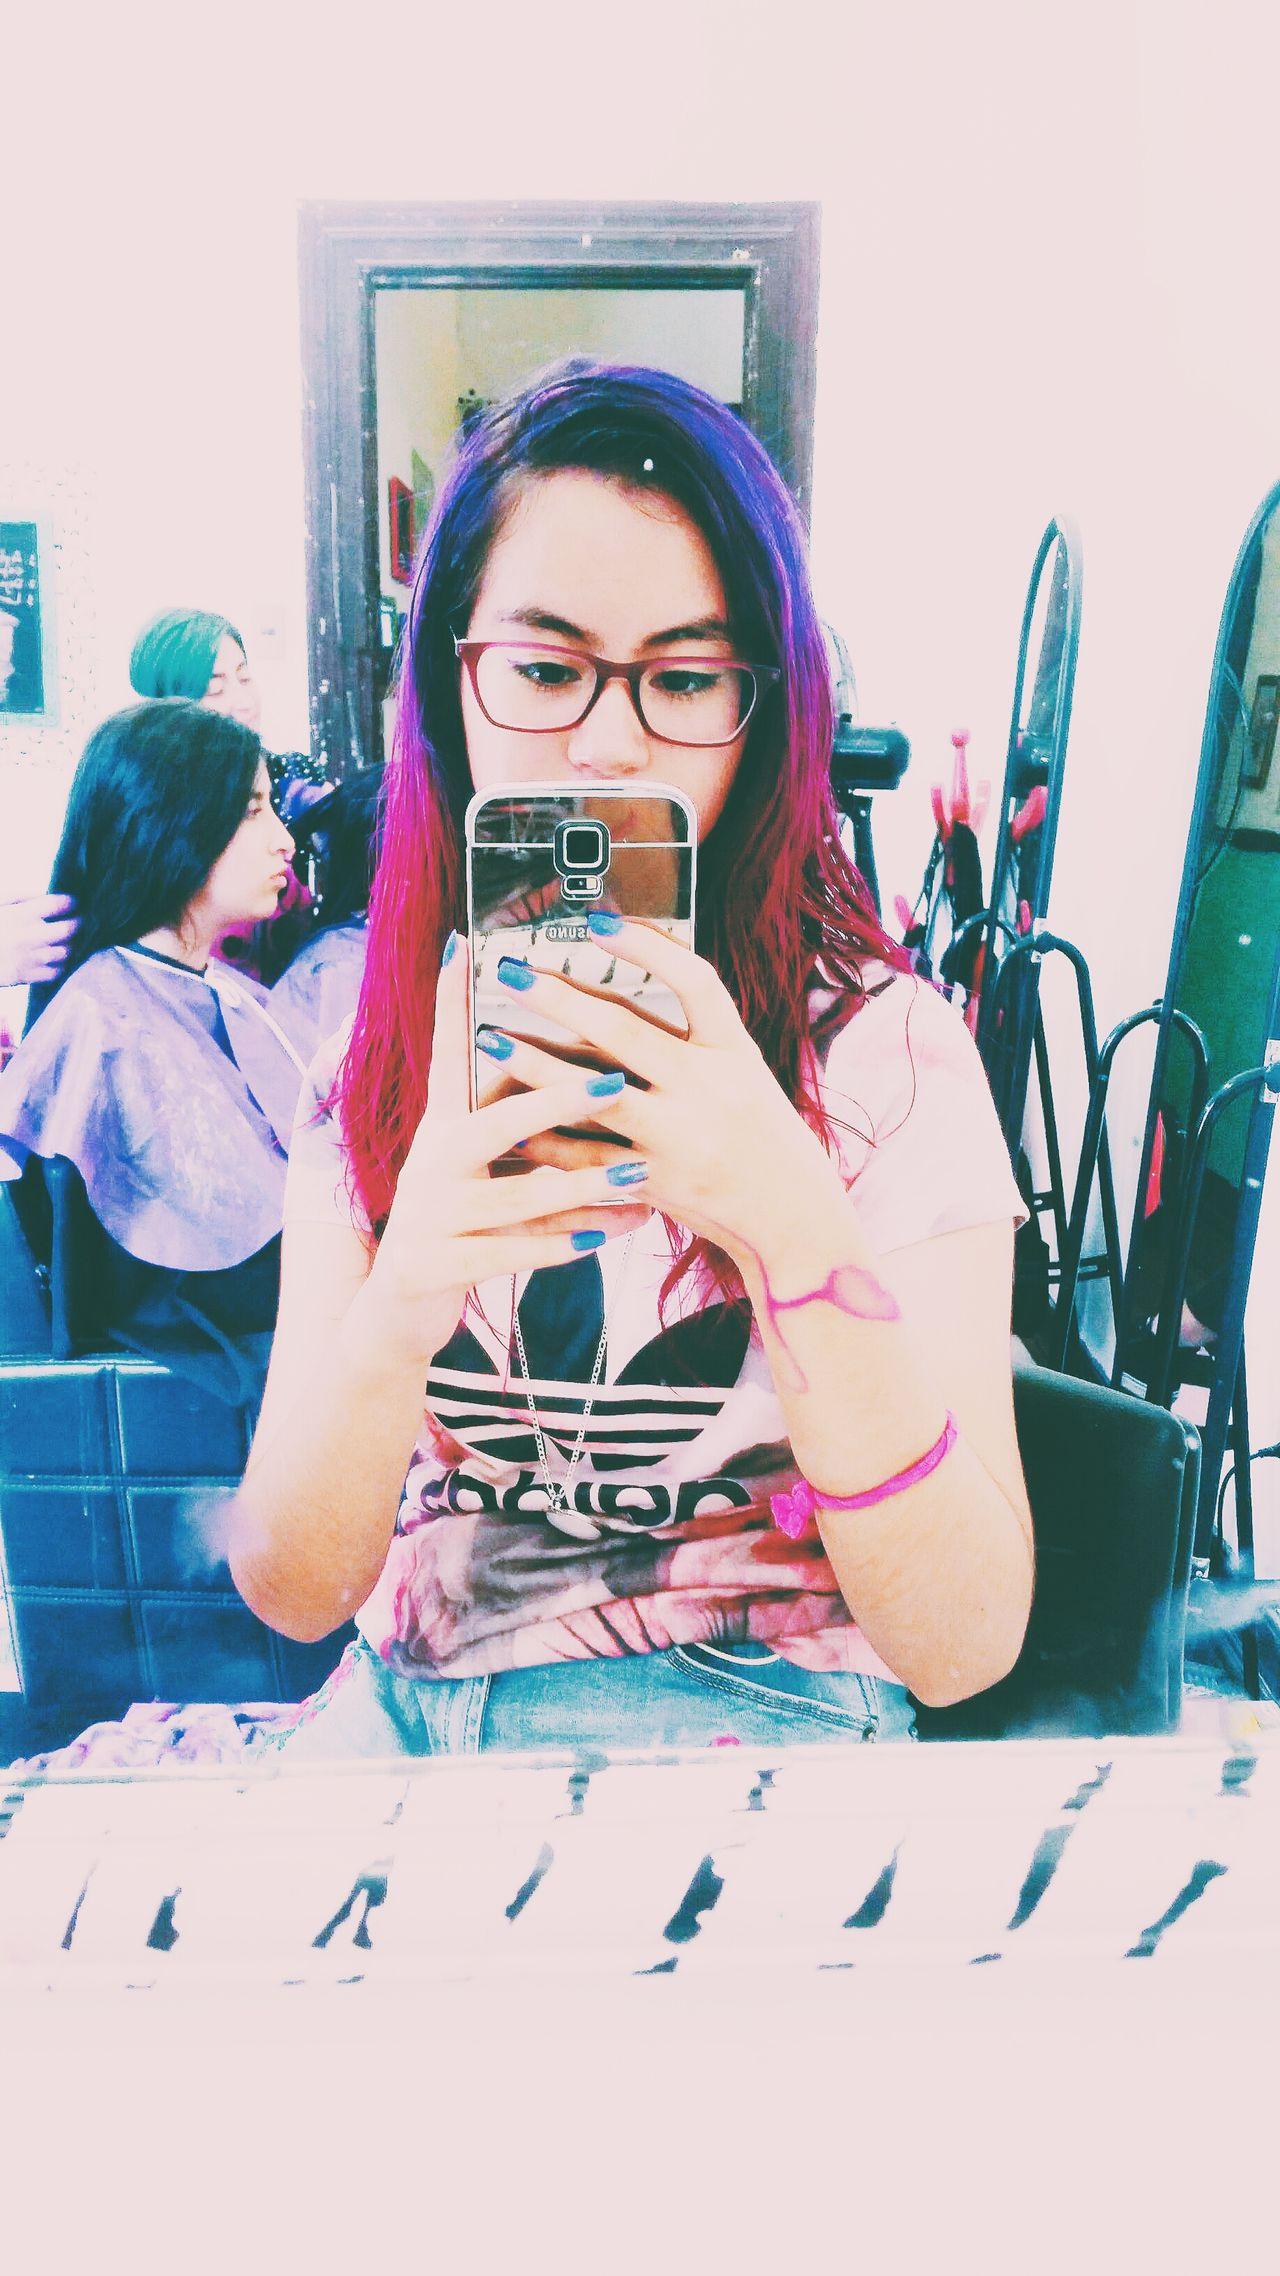 Hair Haircolor Hair Color Hairdye Purplehair Fucsiahair Portrait Taking Photos Photo One Person Check This Out Vscocam